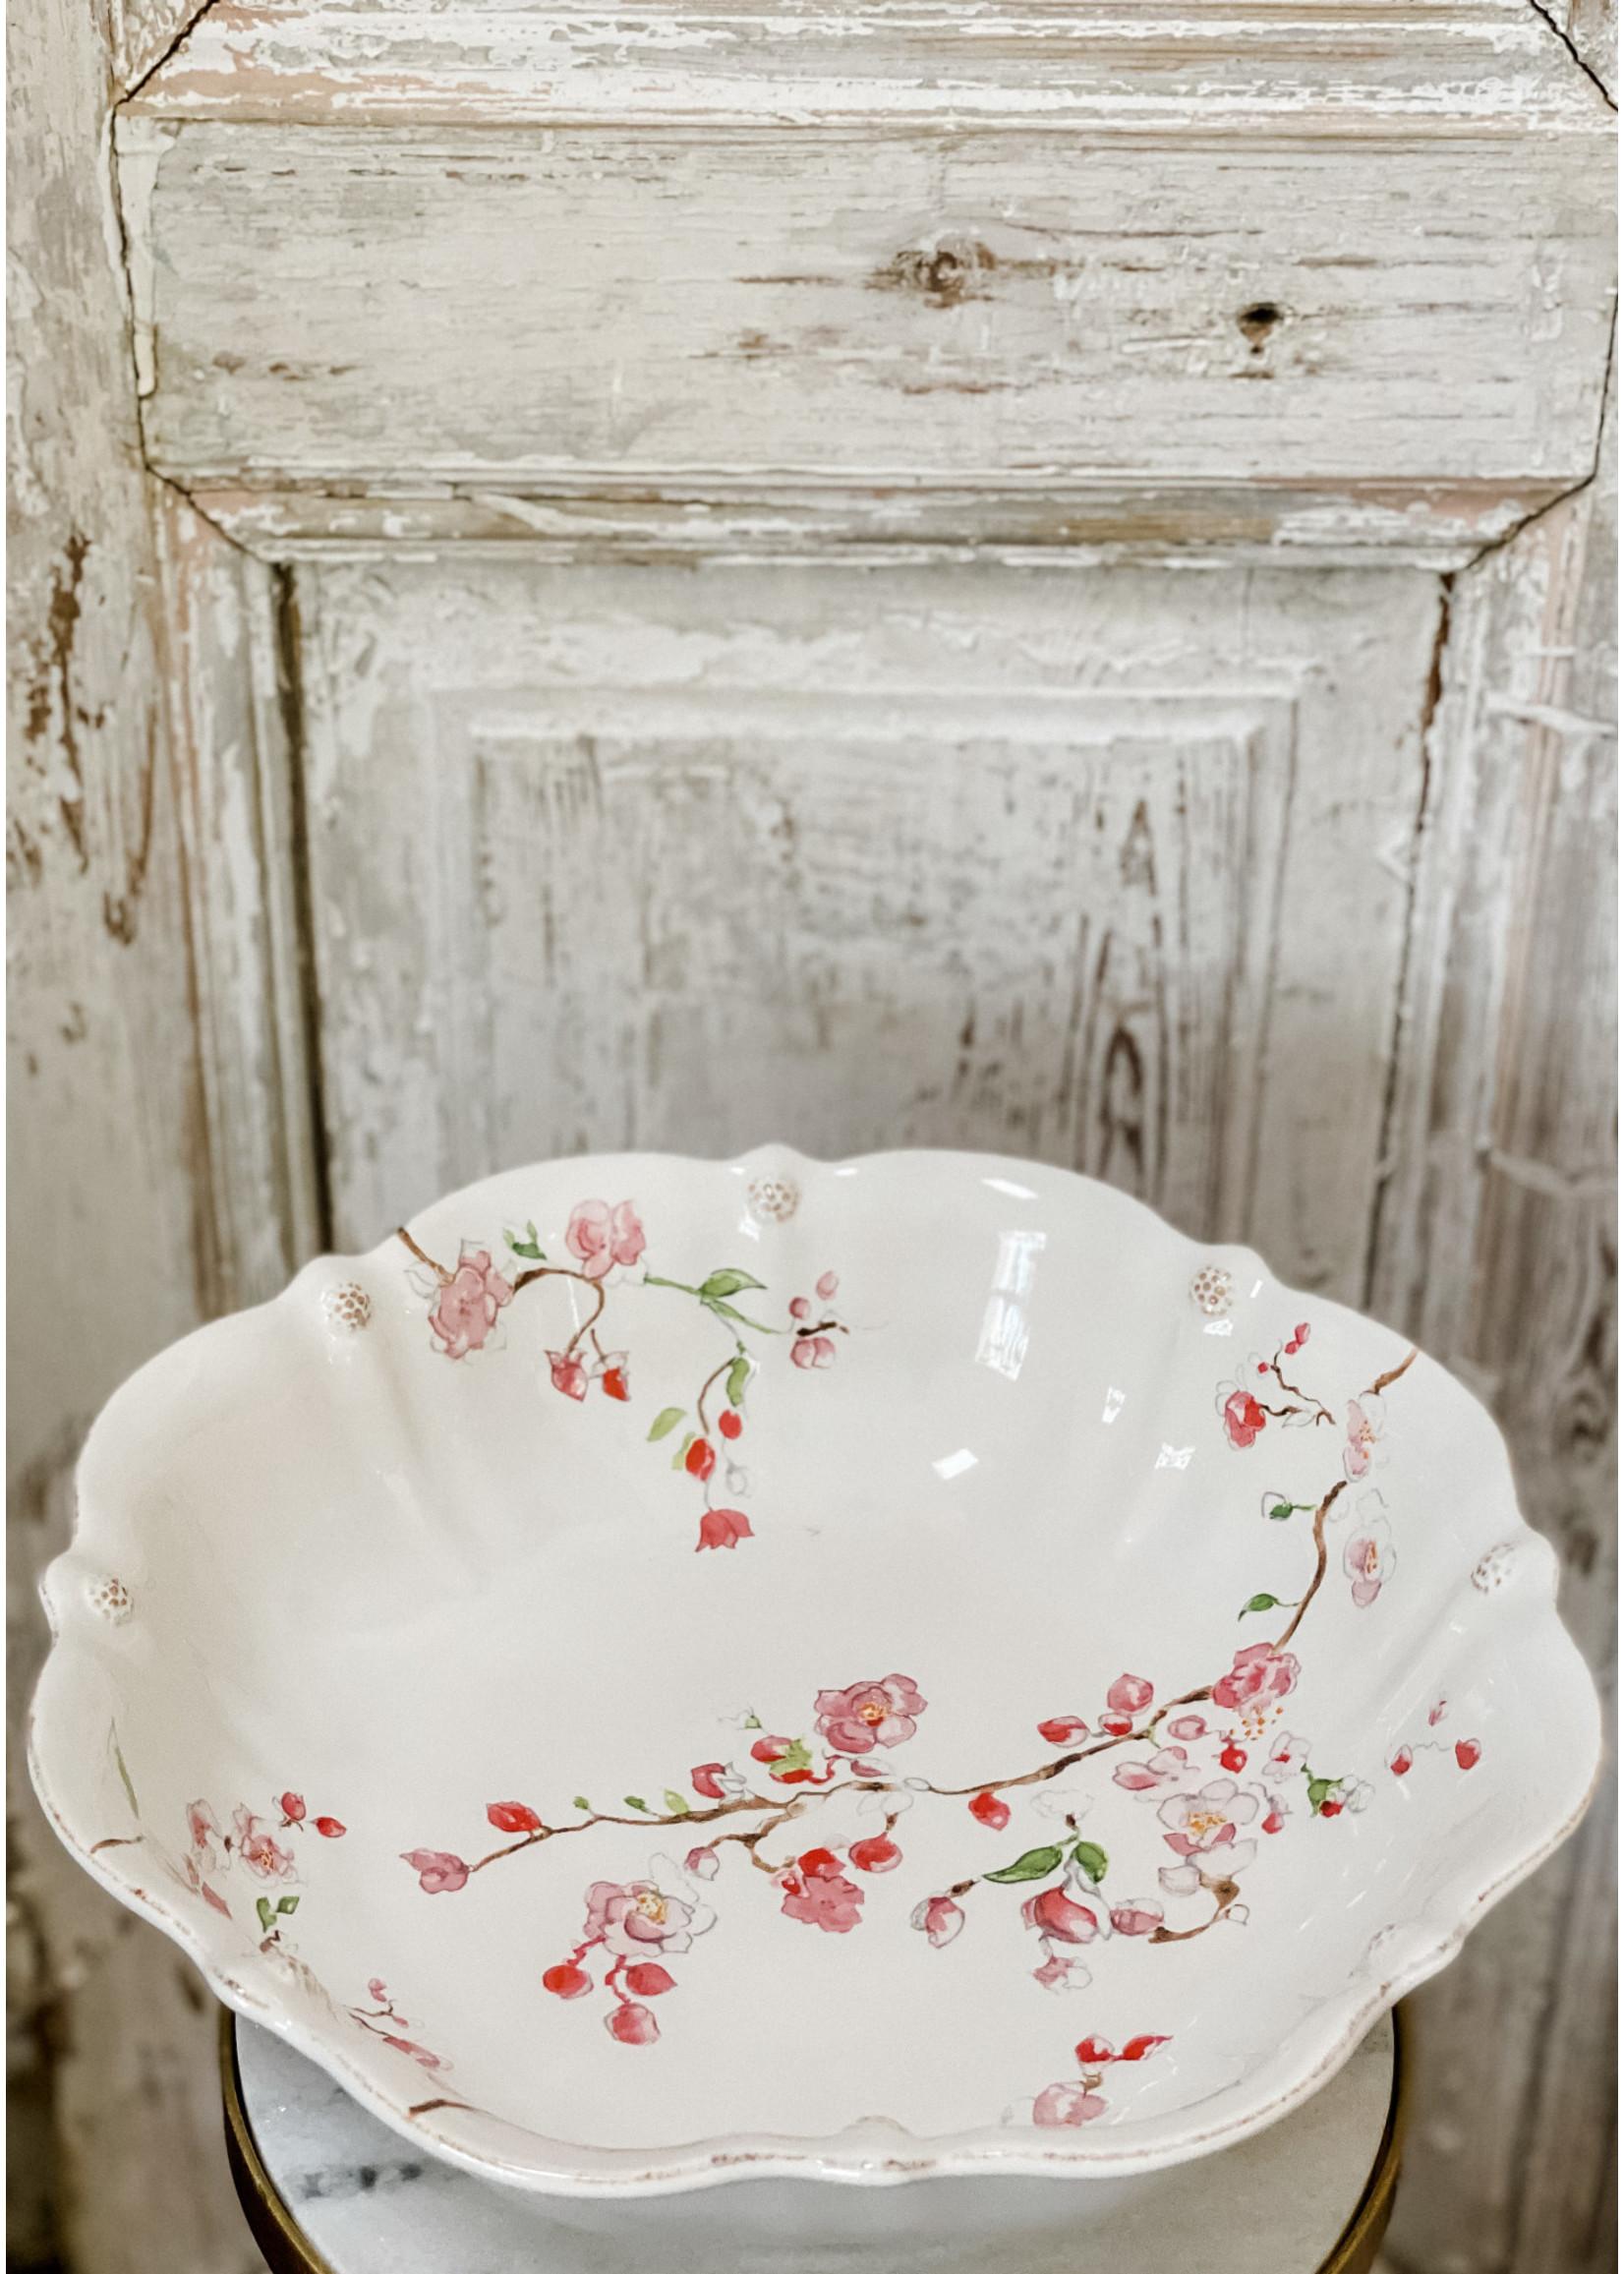 Juliska Berry & Thread Cherry Blossom - Serving Bowl